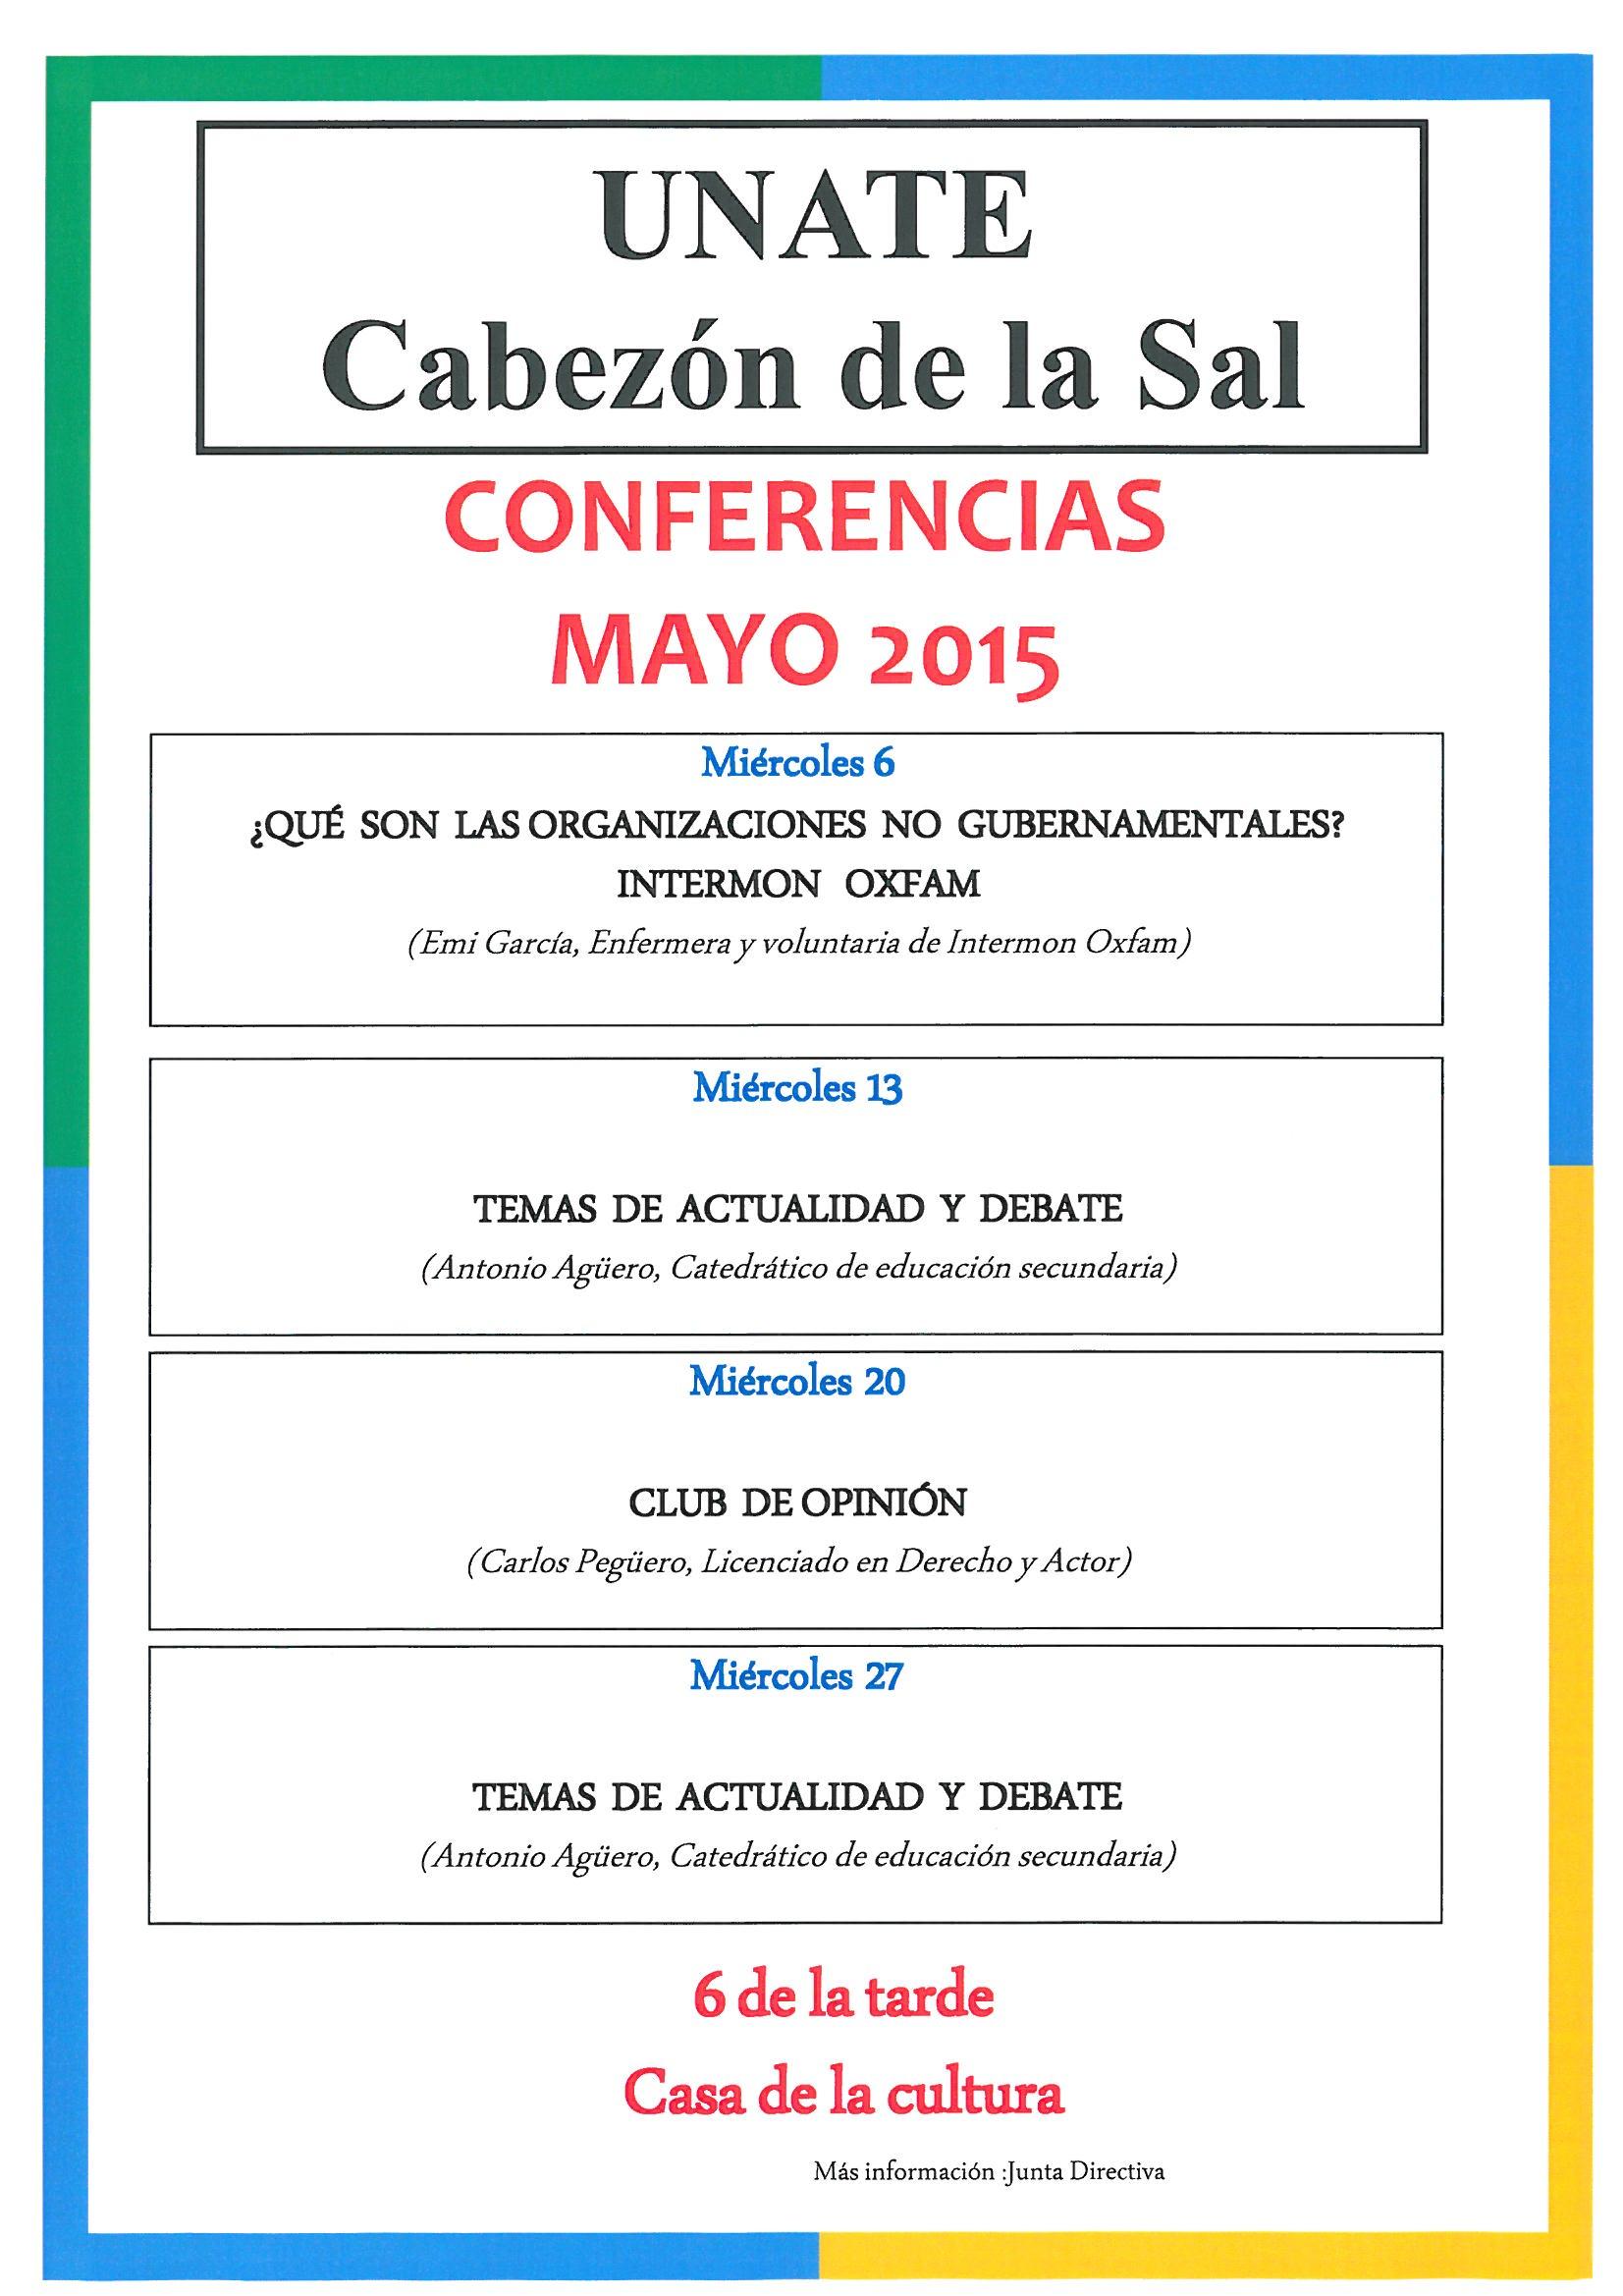 http://www.cabezondelasal.net/wp-content/uploads/2015/05/Sc280sajaco15052008580_0003.jpg